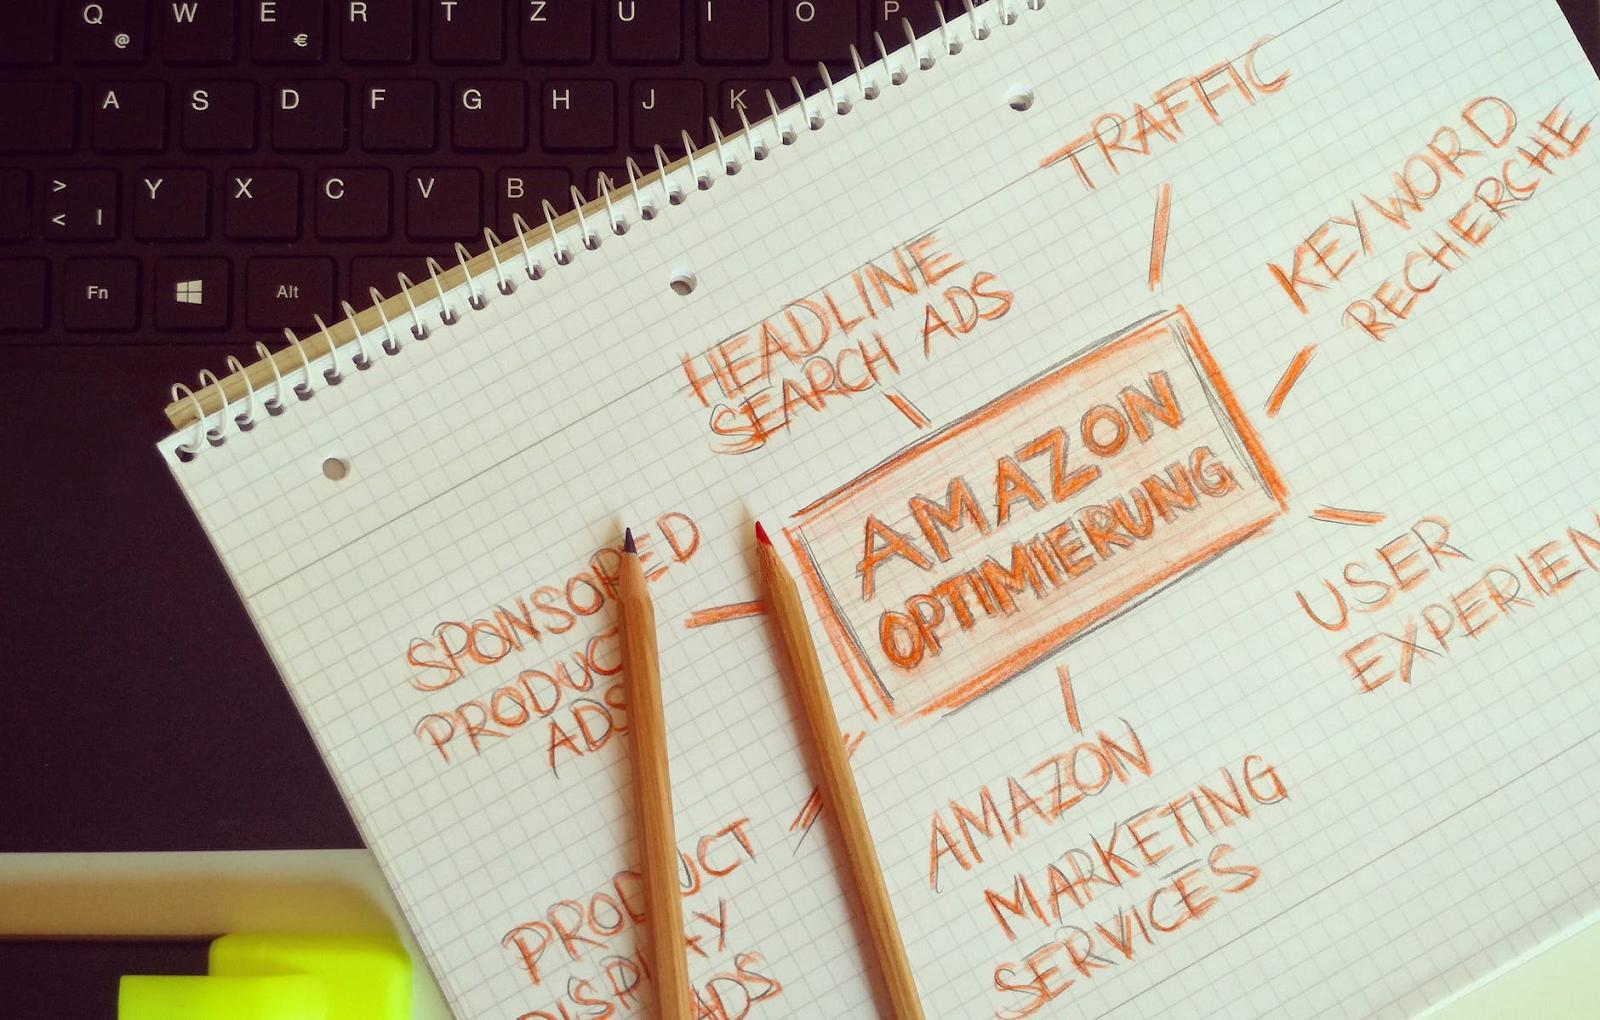 Amazon Optimization Plan